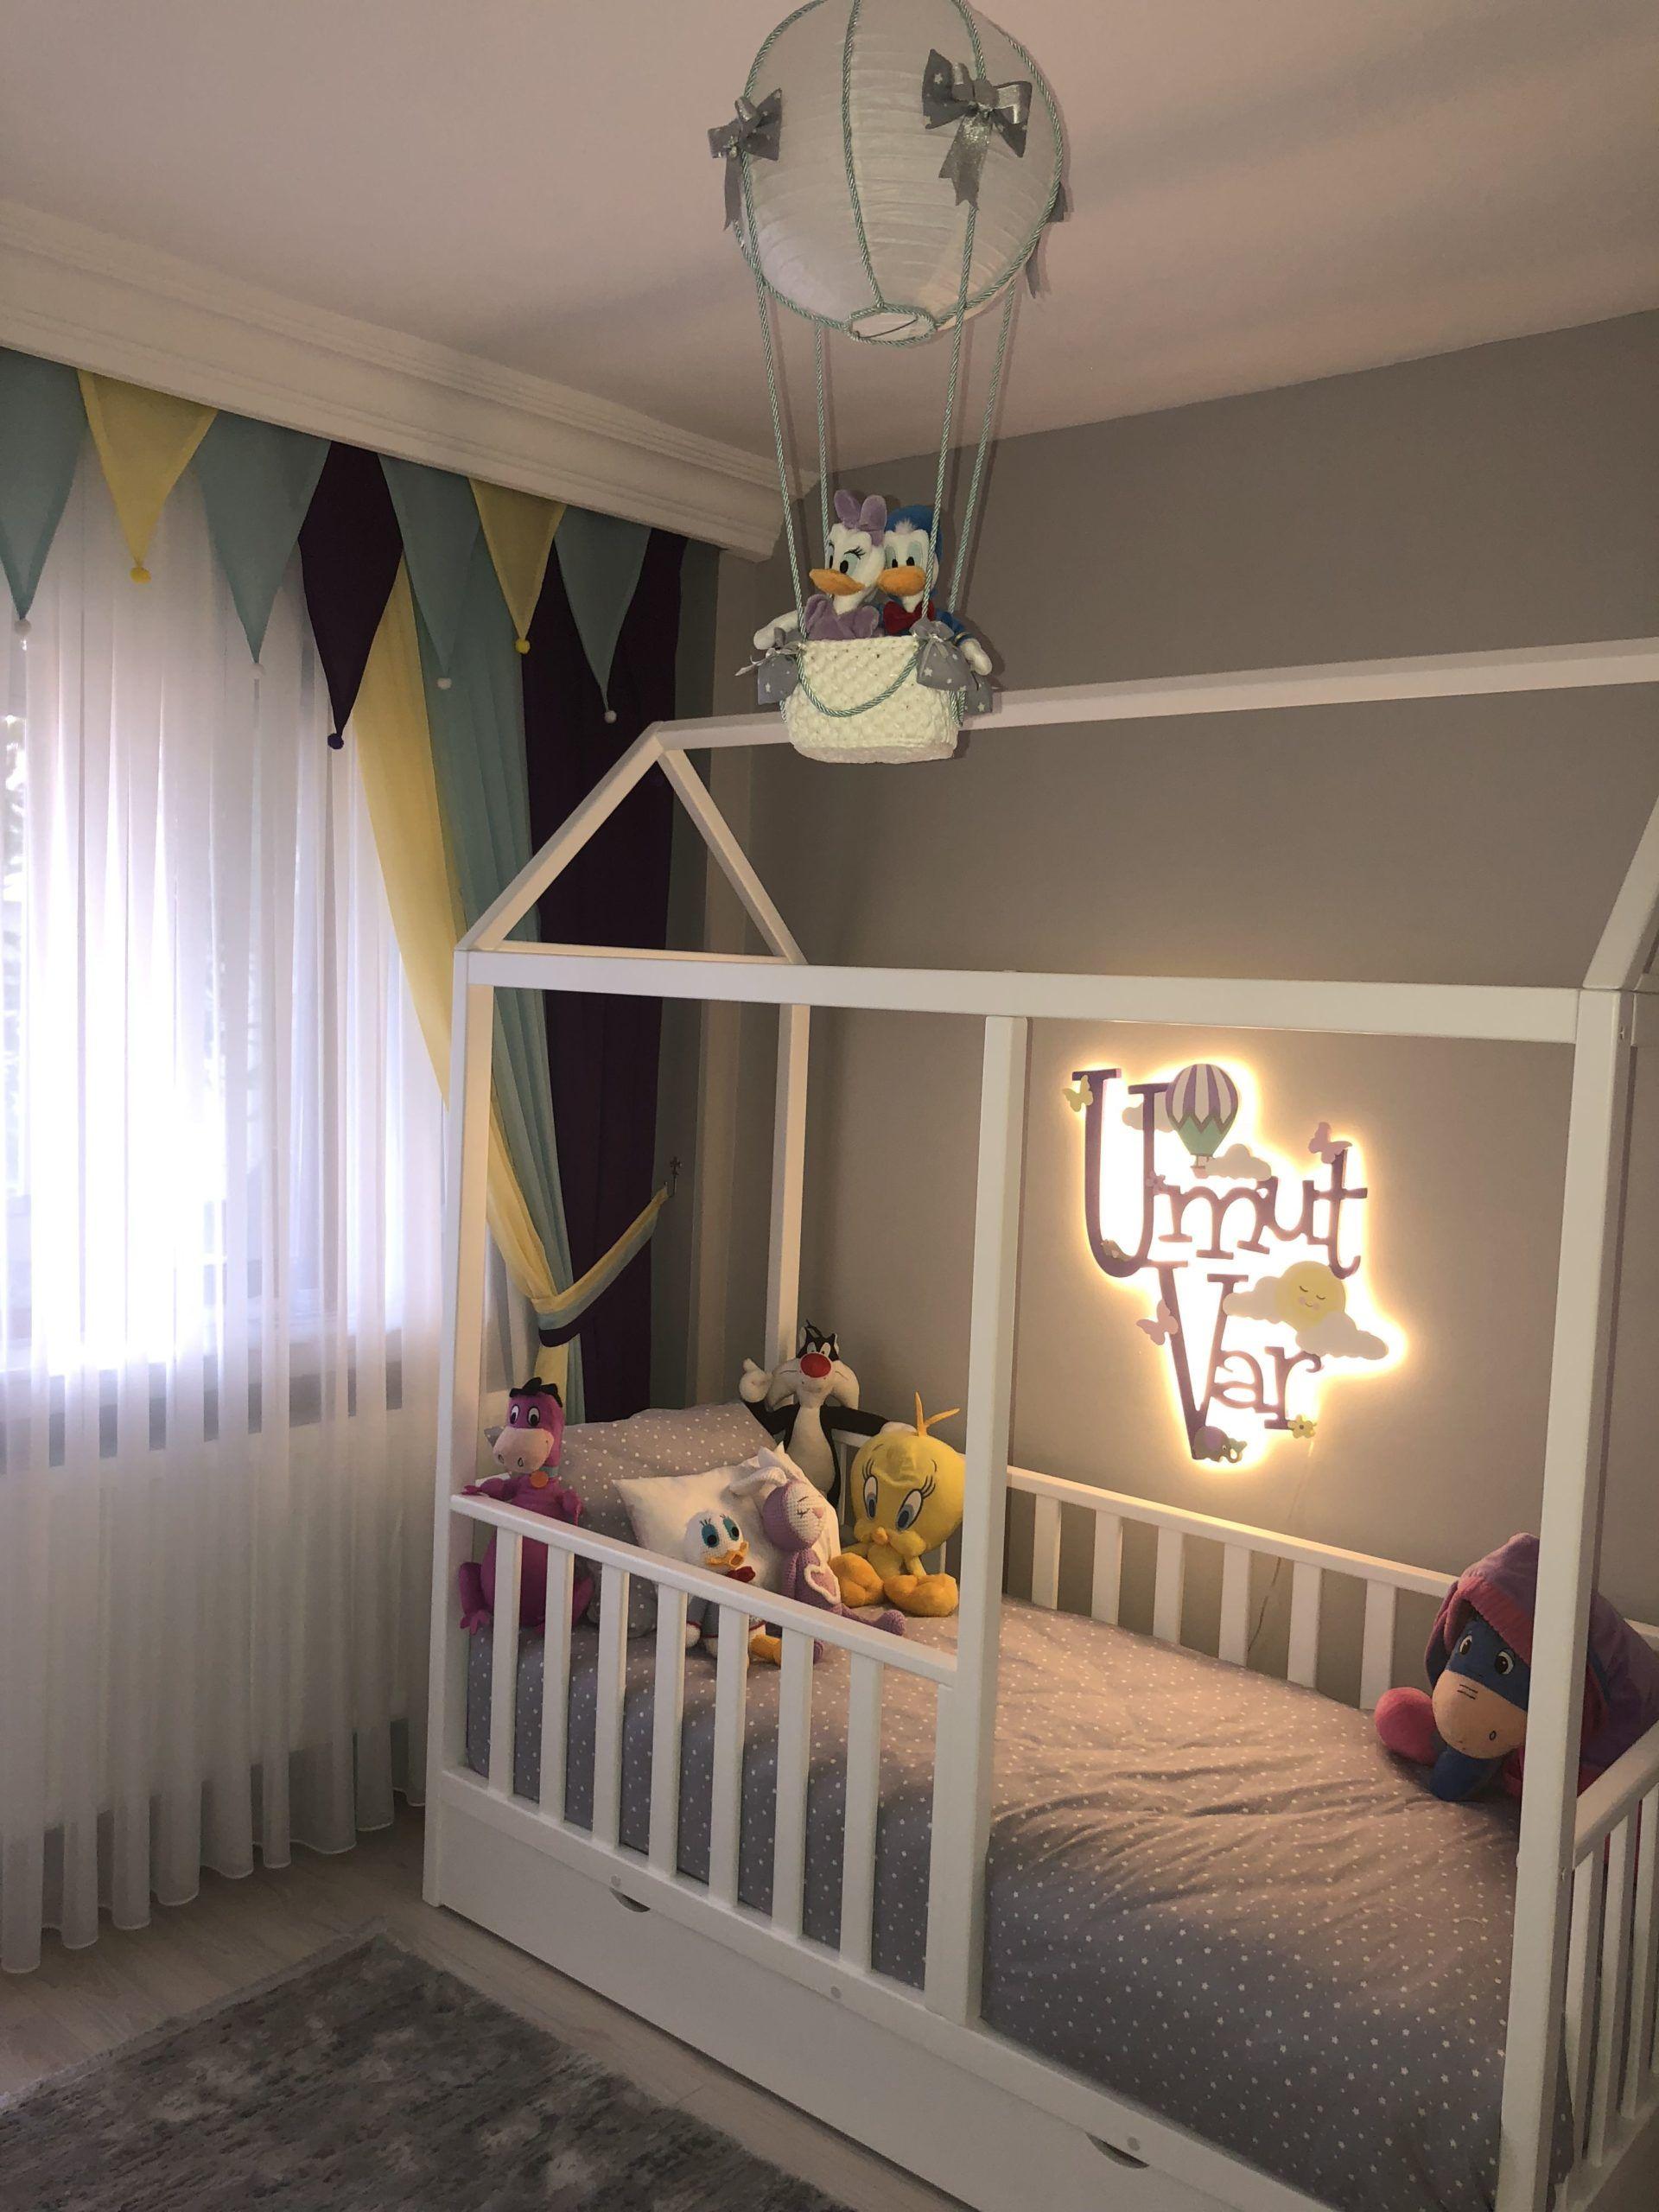 babyraumideen vorhangmuster lampendesign  bebek odası